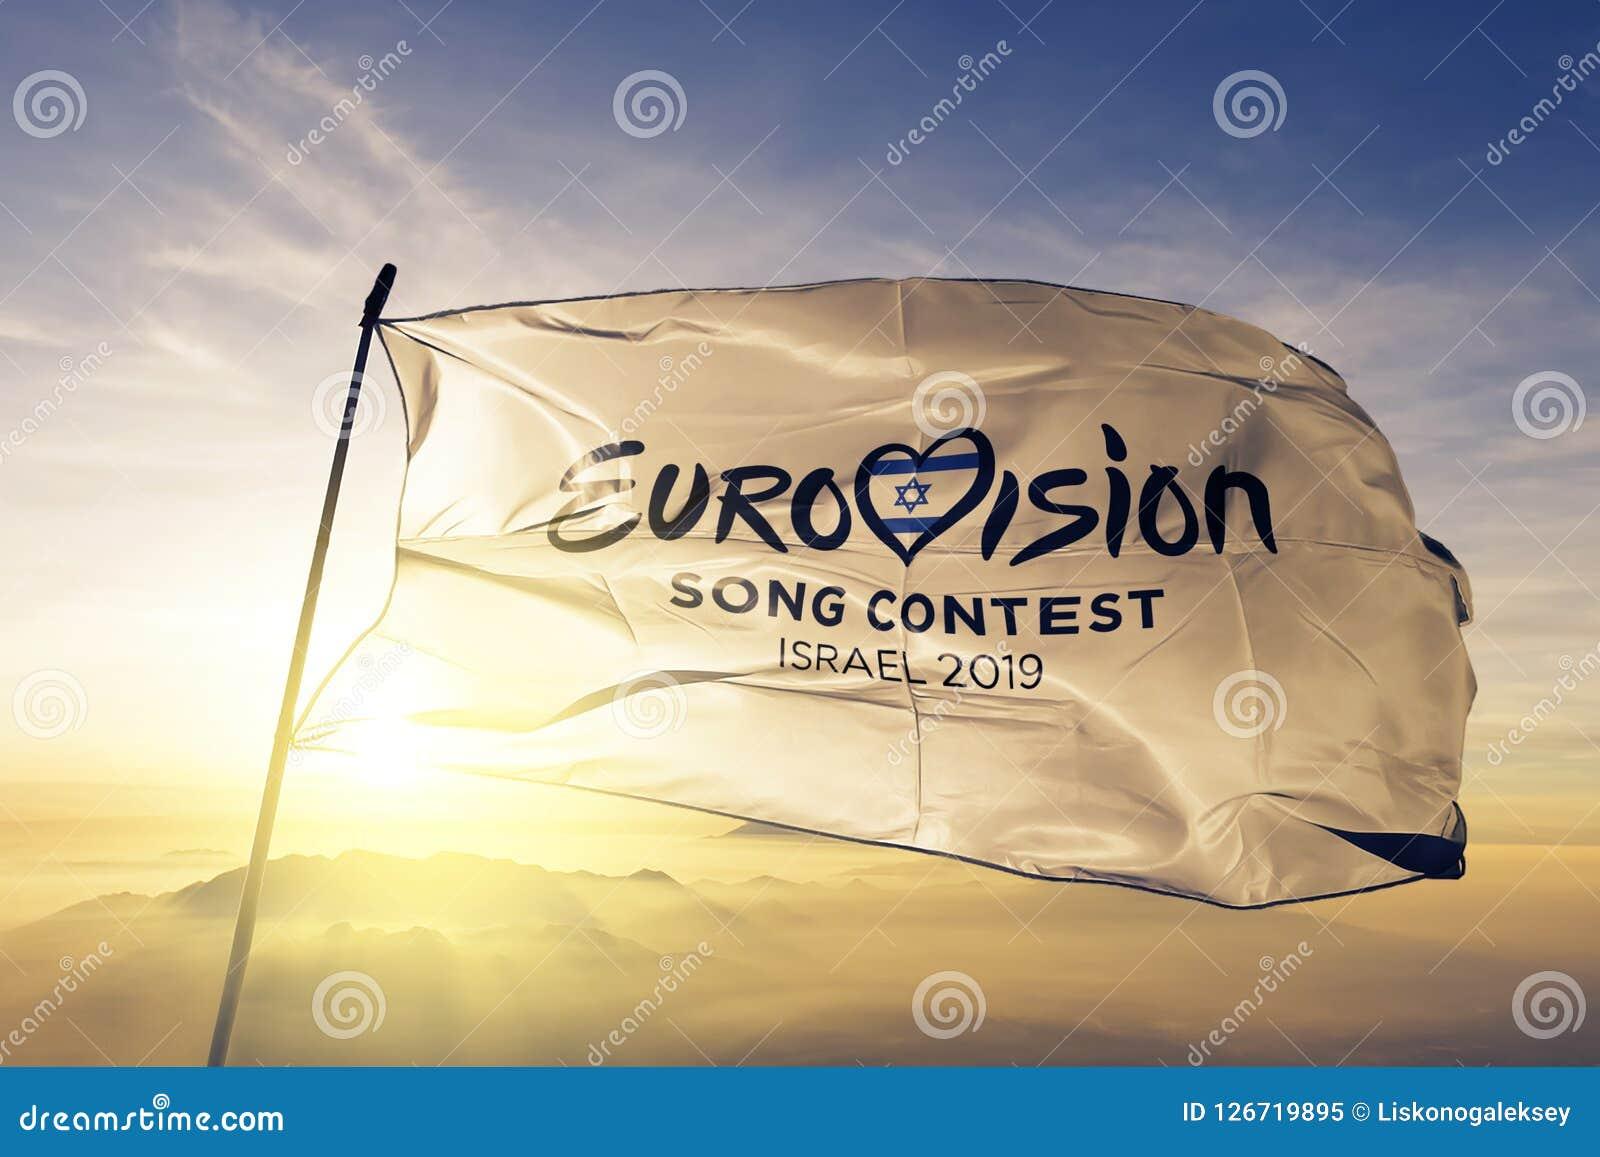 Eurovision Song Contest 2019 logo flag textile cloth fabric waving on the top sunrise mist fog